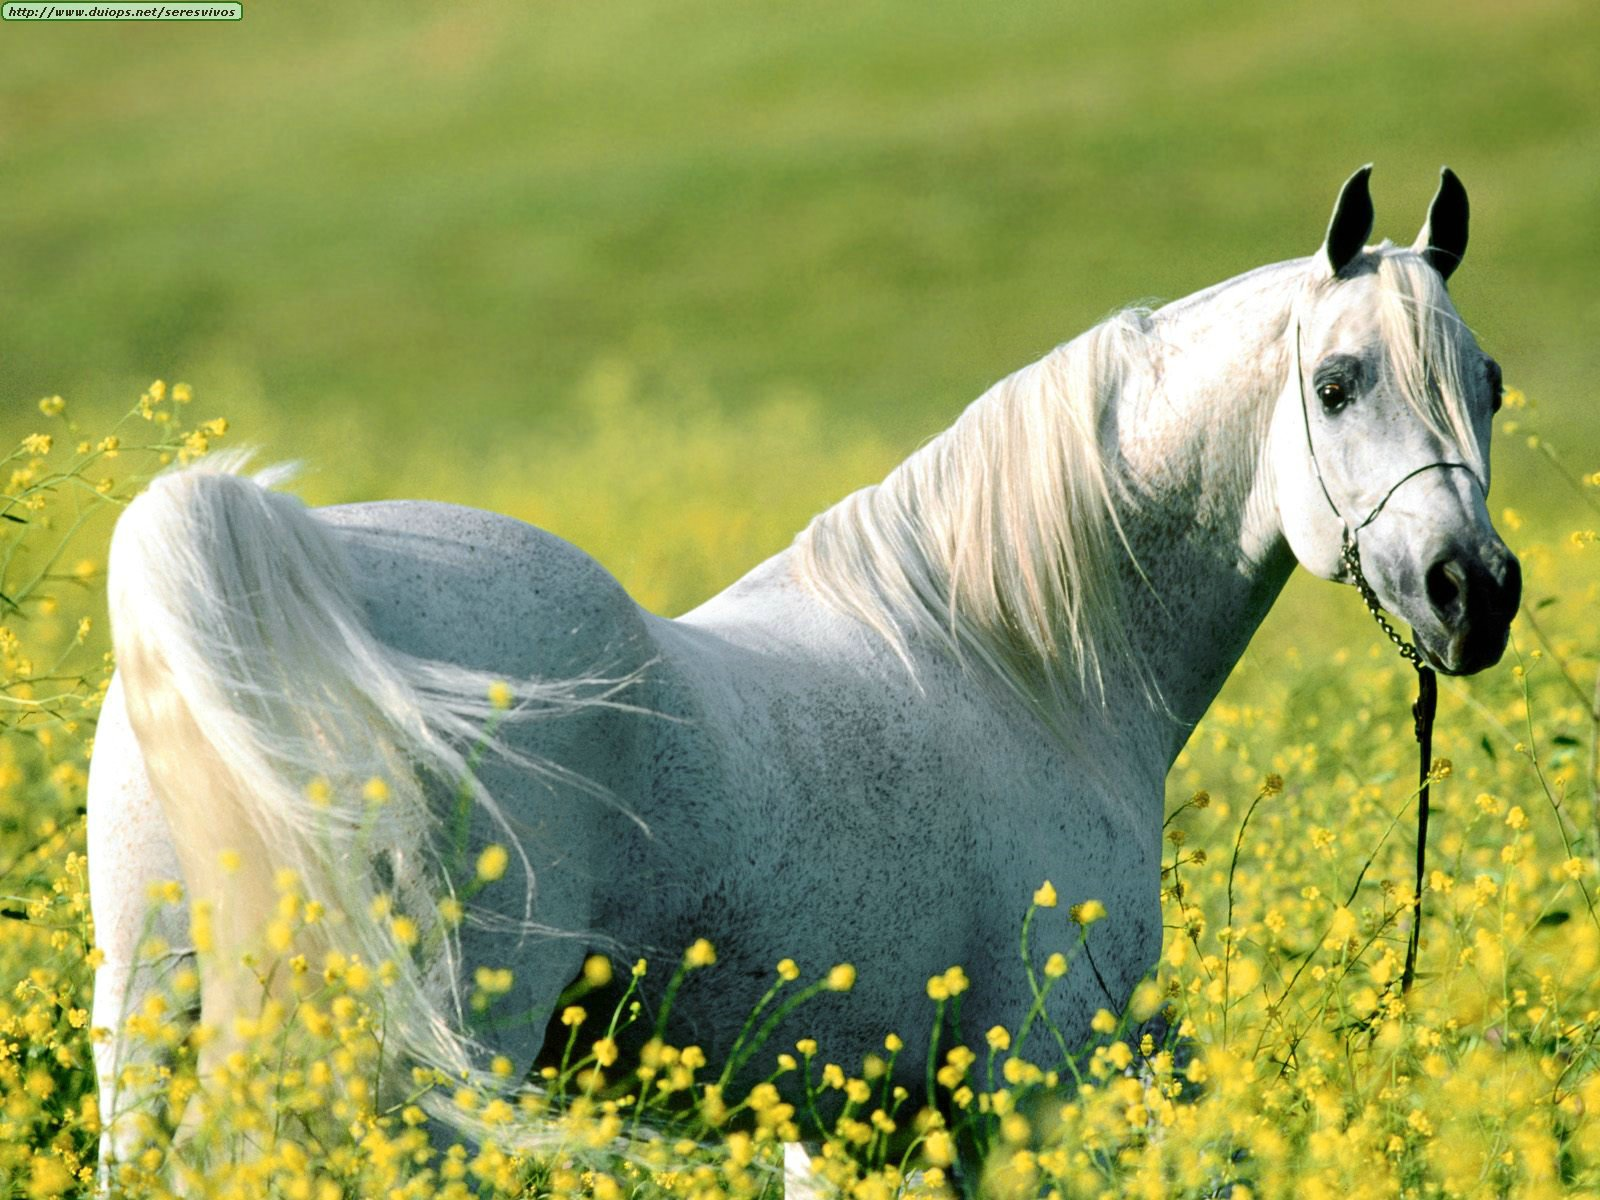 http://www.duiops.net/seresvivos/galeria/caballos/Animals%20Horses_Among%20the%20Fields%20of%20Gold,%20Arabian%20Stallion.jpg